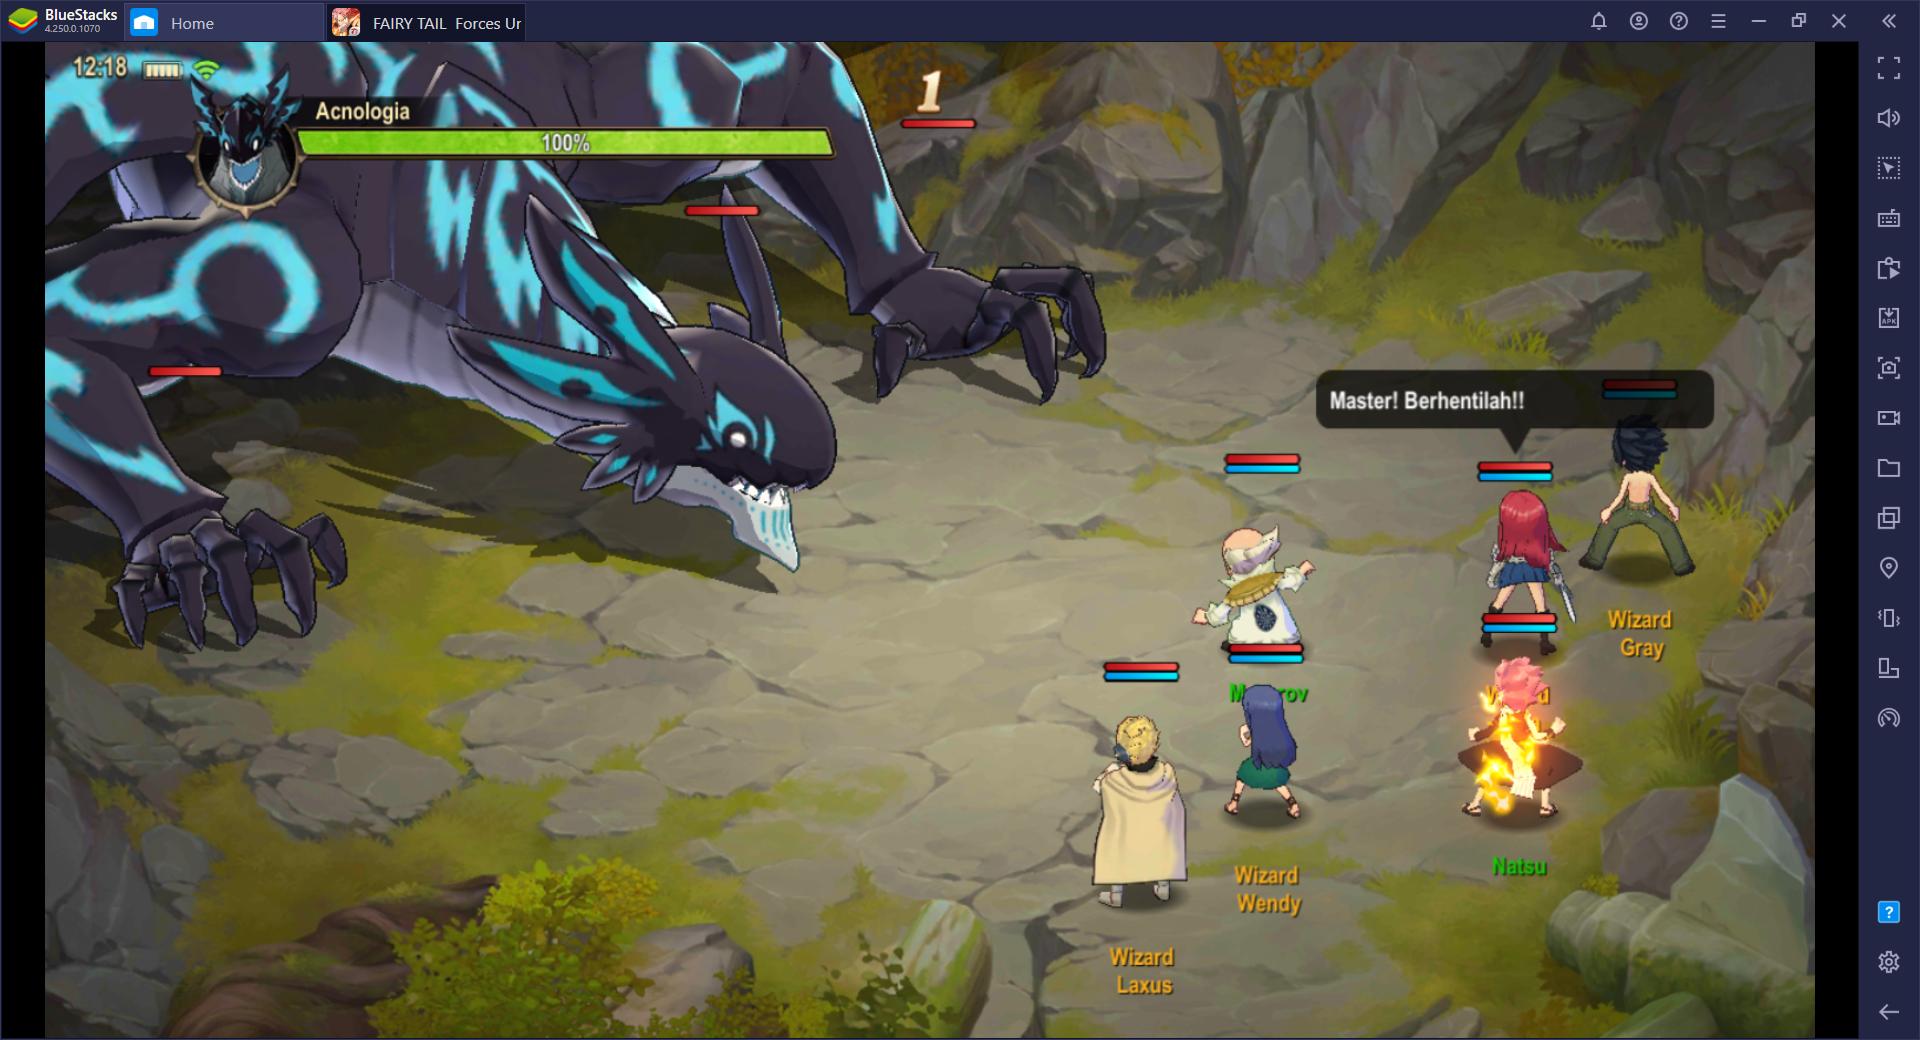 FAIRY TAIL: Forces Unite! – Mainkan Game Anime Mobile Ini di BlueStacks